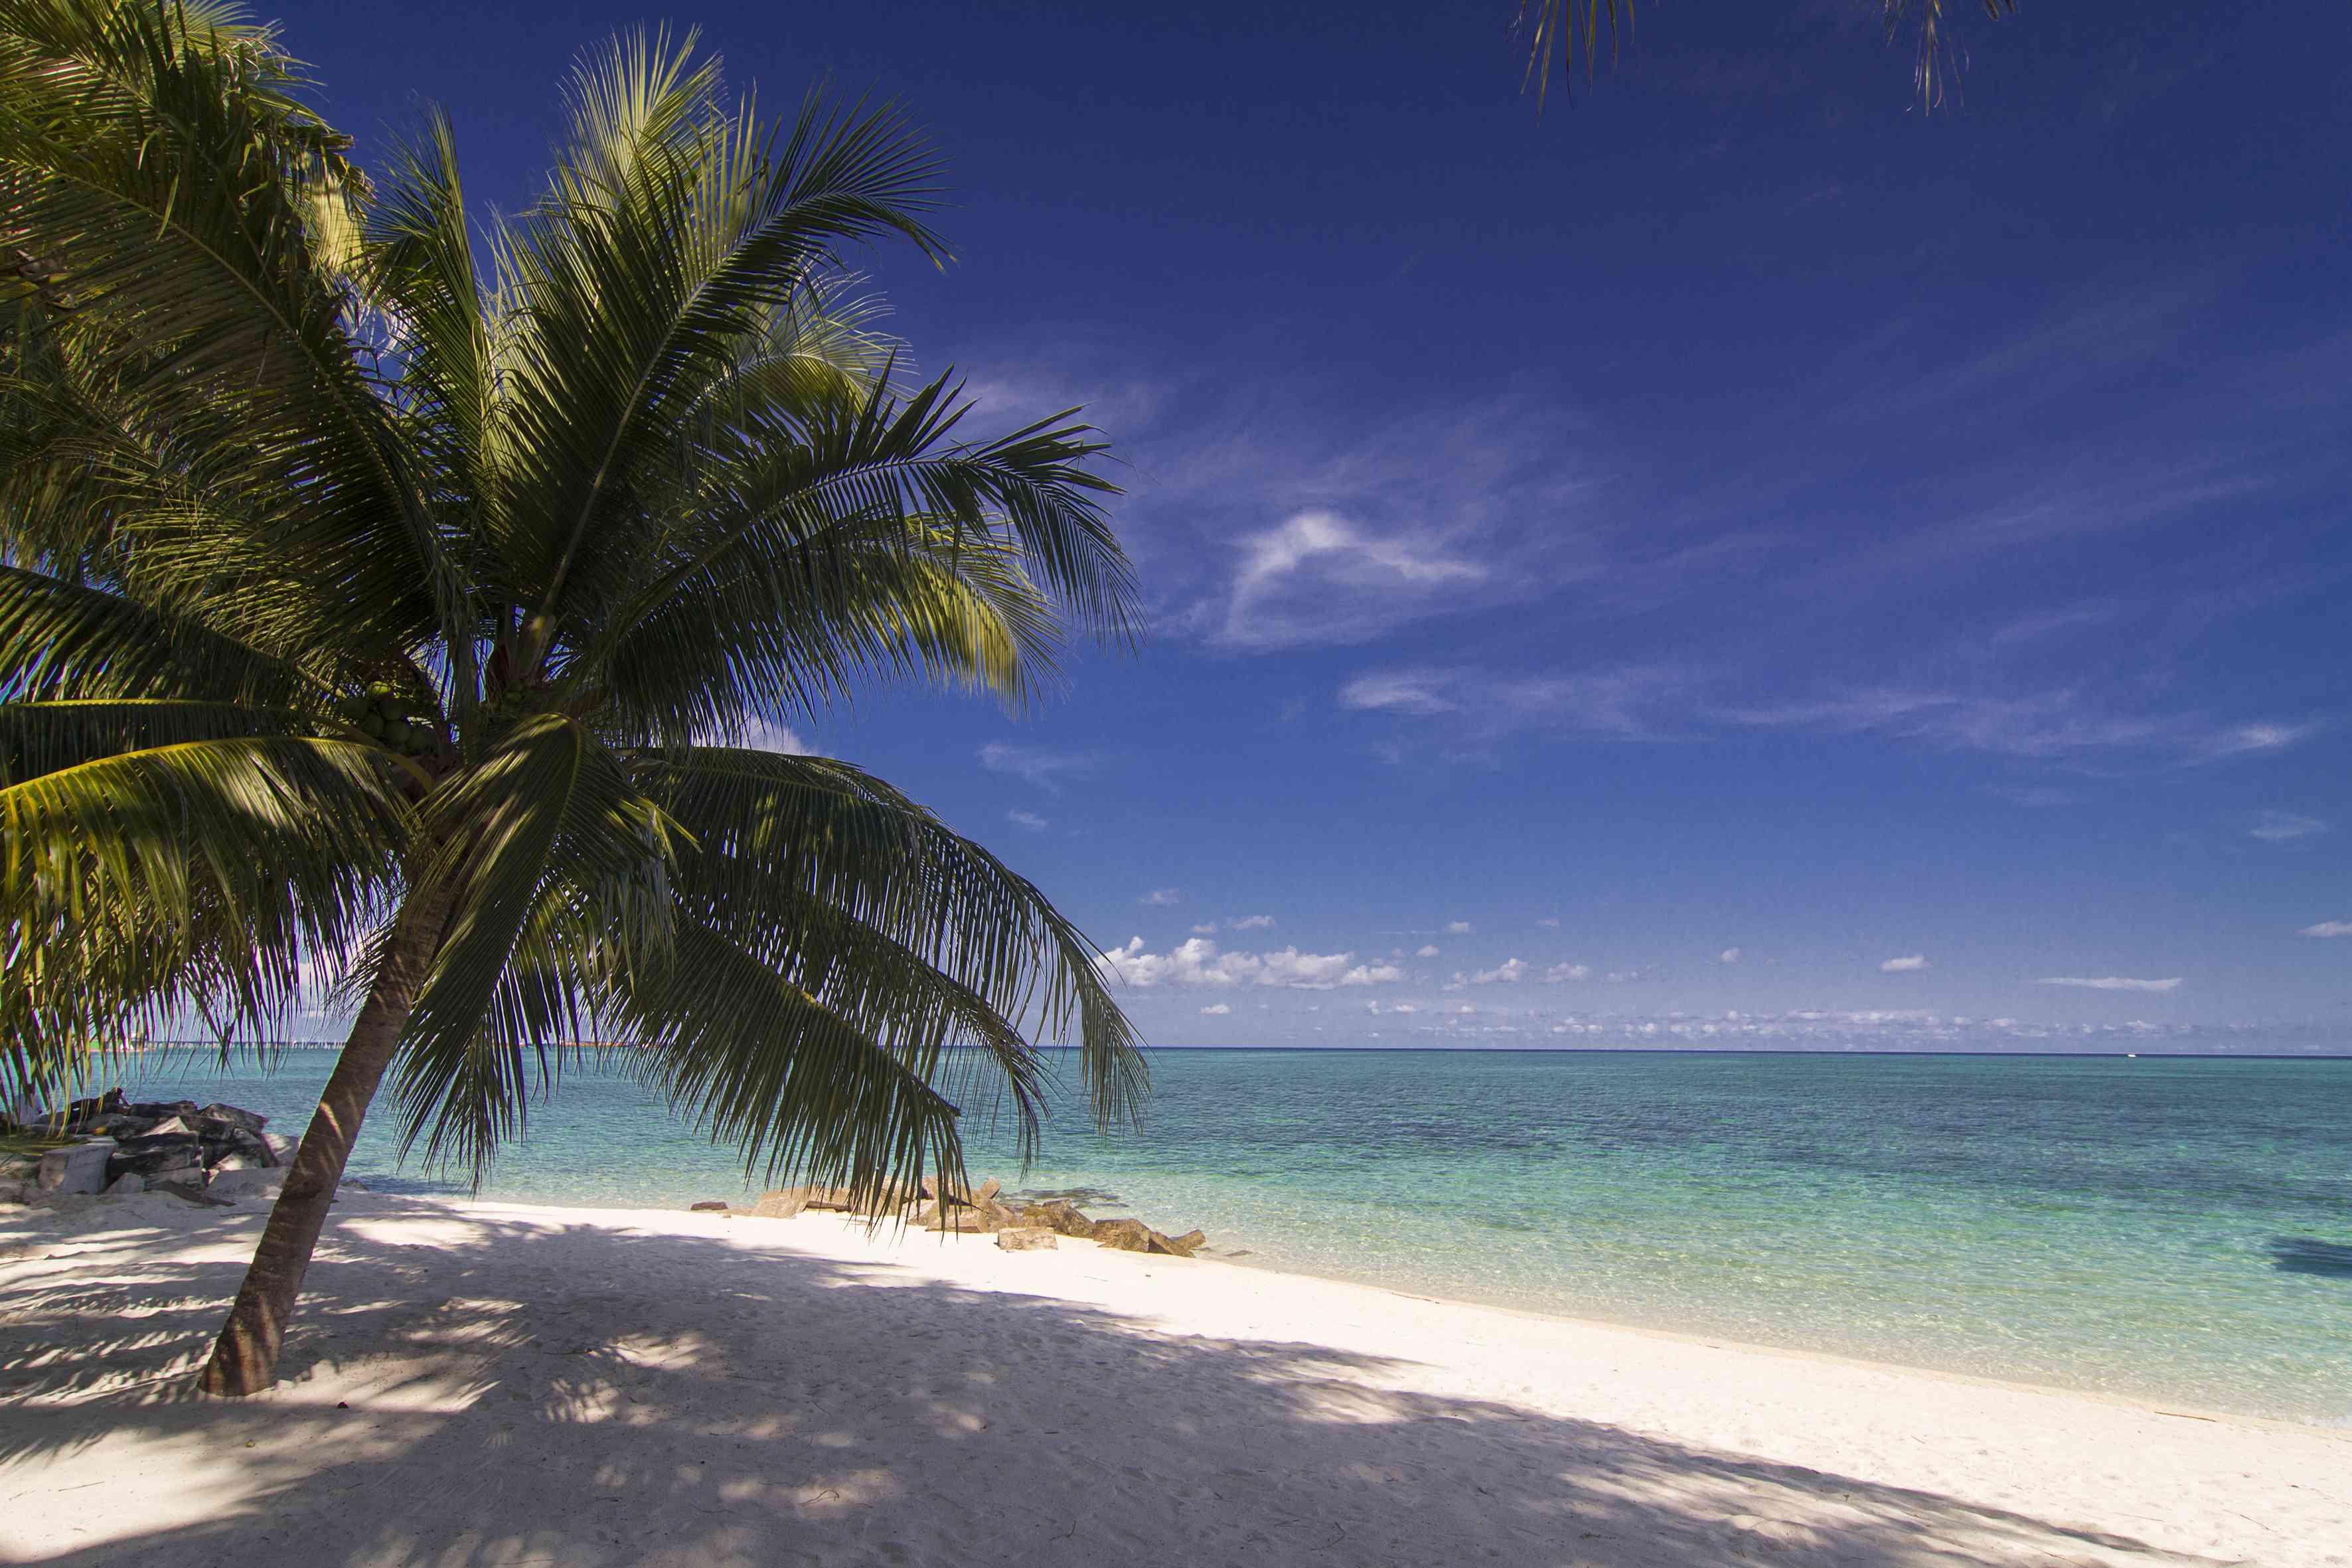 Palm tree on the beach at Mabul Island, Sabah, Borneo